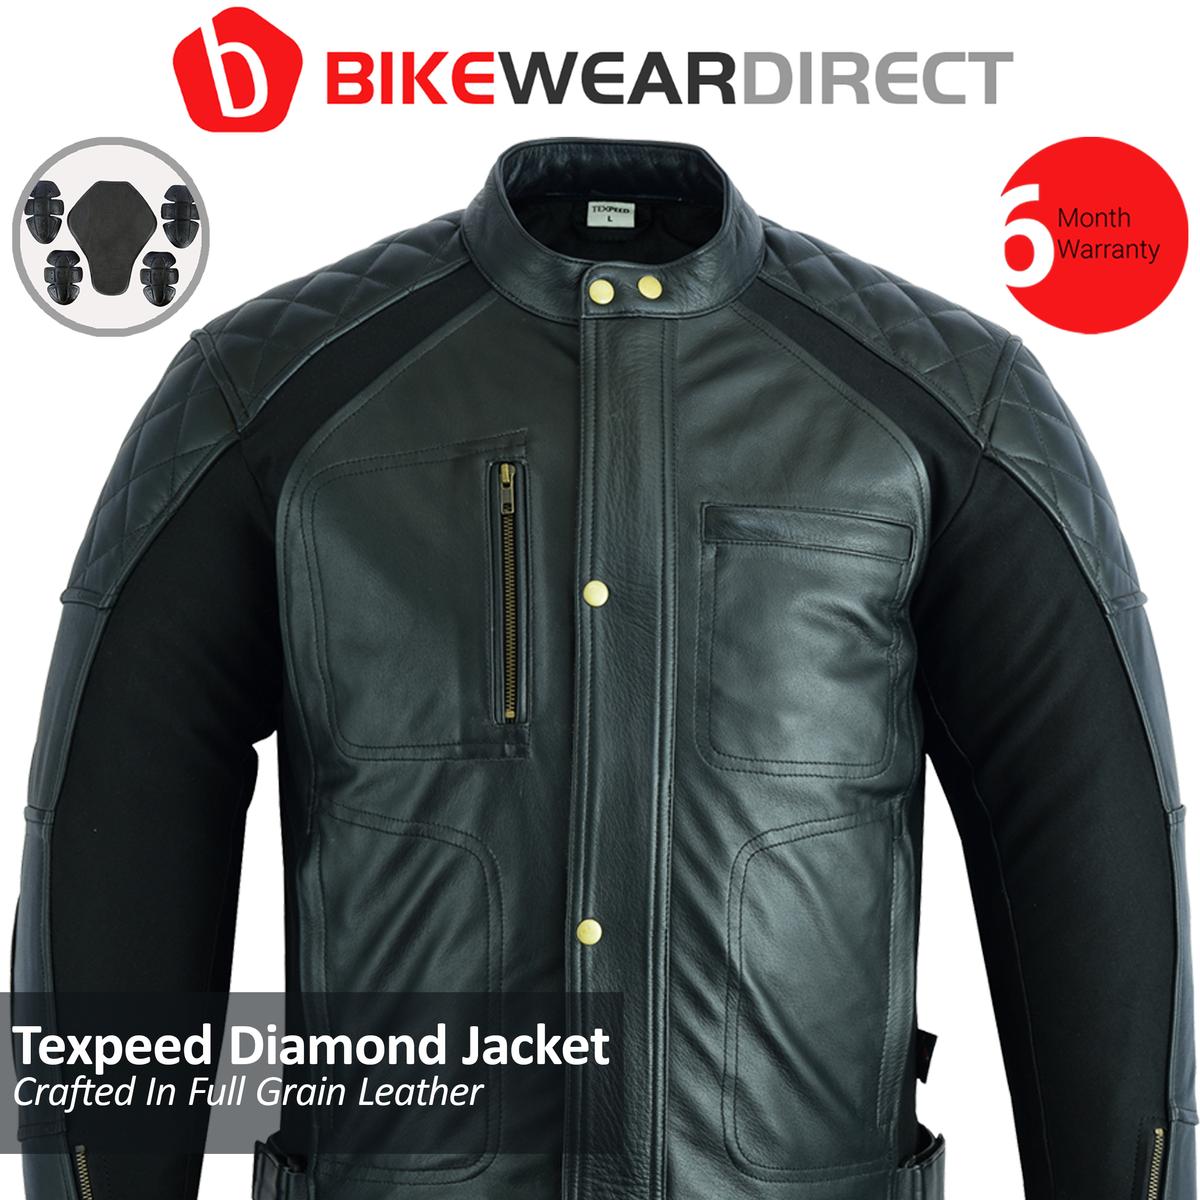 Texpeed DIA Stretch Leather Jacket